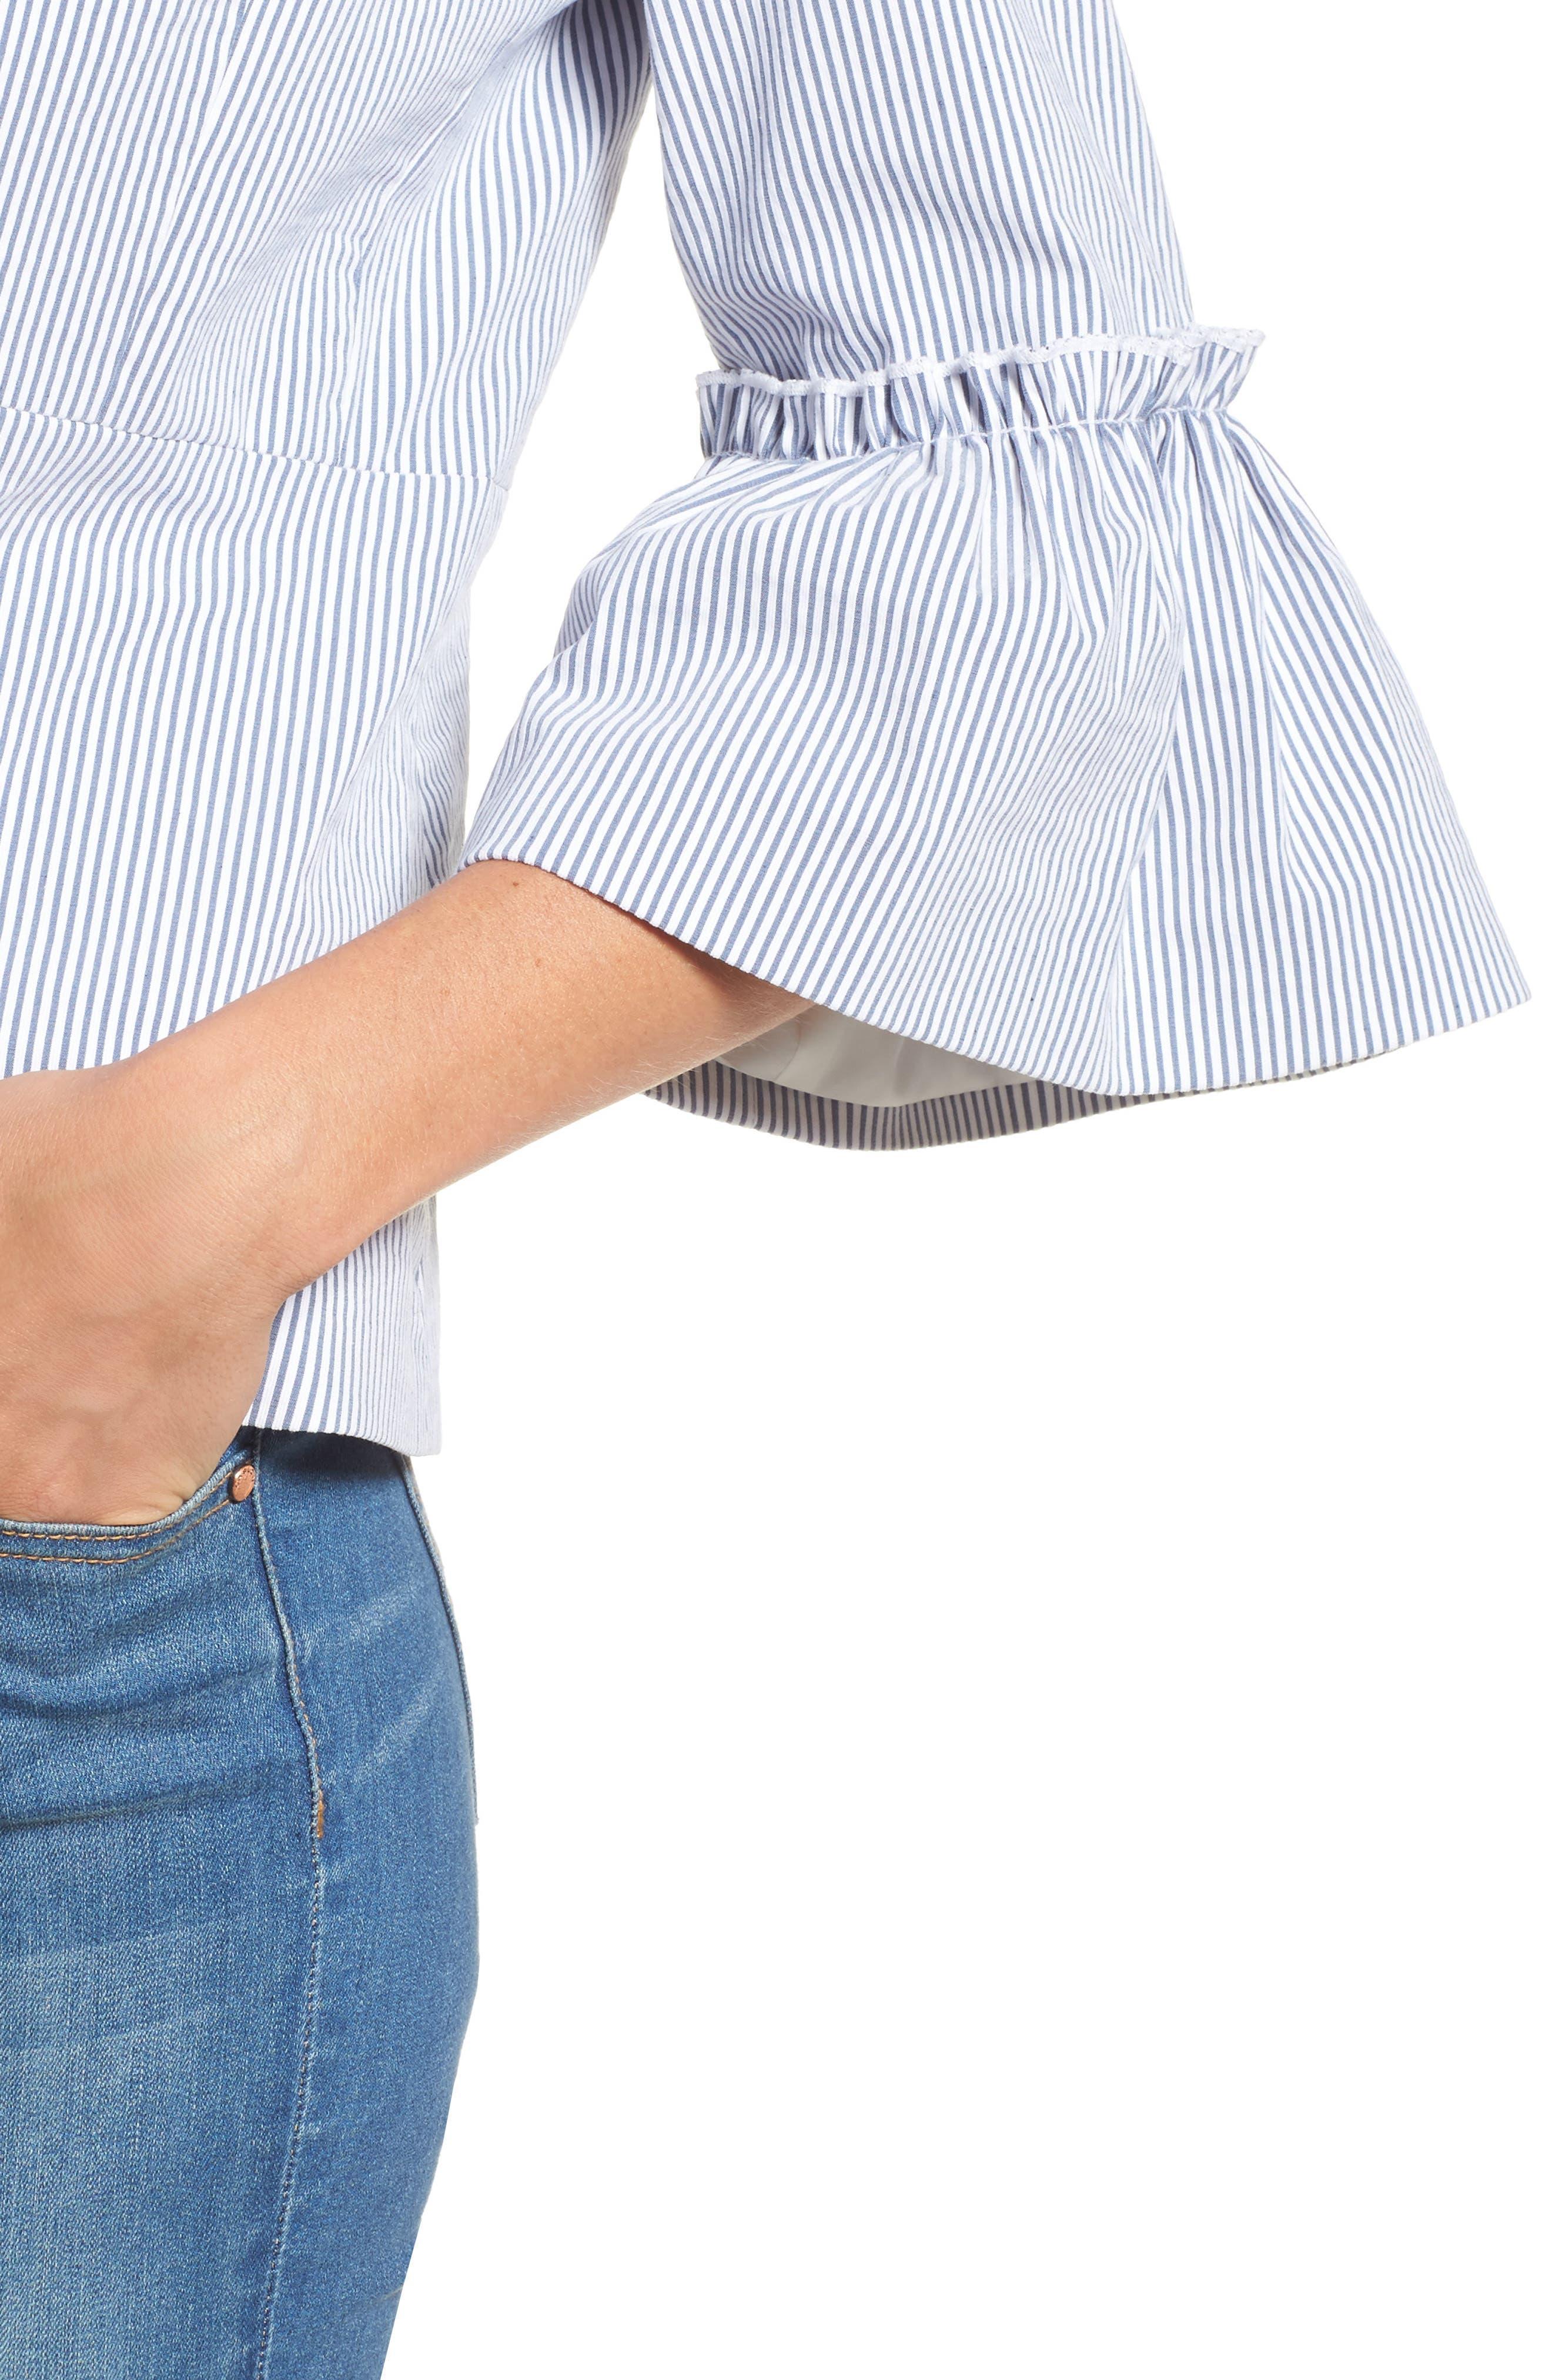 Ruffle Sleeve Open Jacket,                             Alternate thumbnail 4, color,                             Blue- White Seersucker